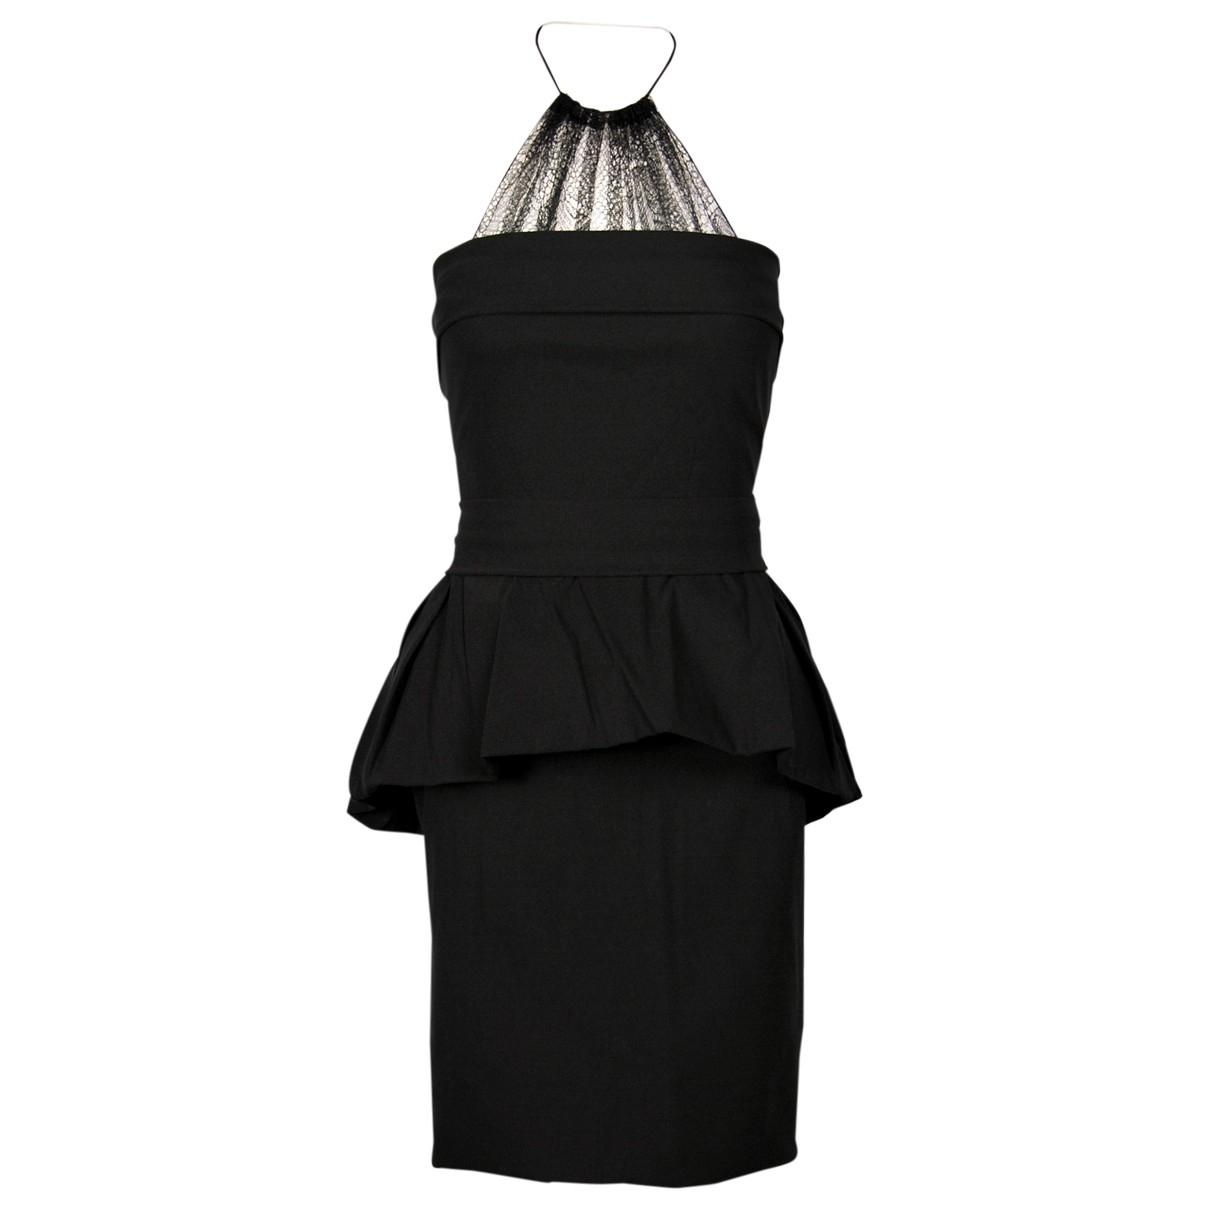 Preen By Thornton Bregazzi \N Kleid in  Schwarz Synthetik